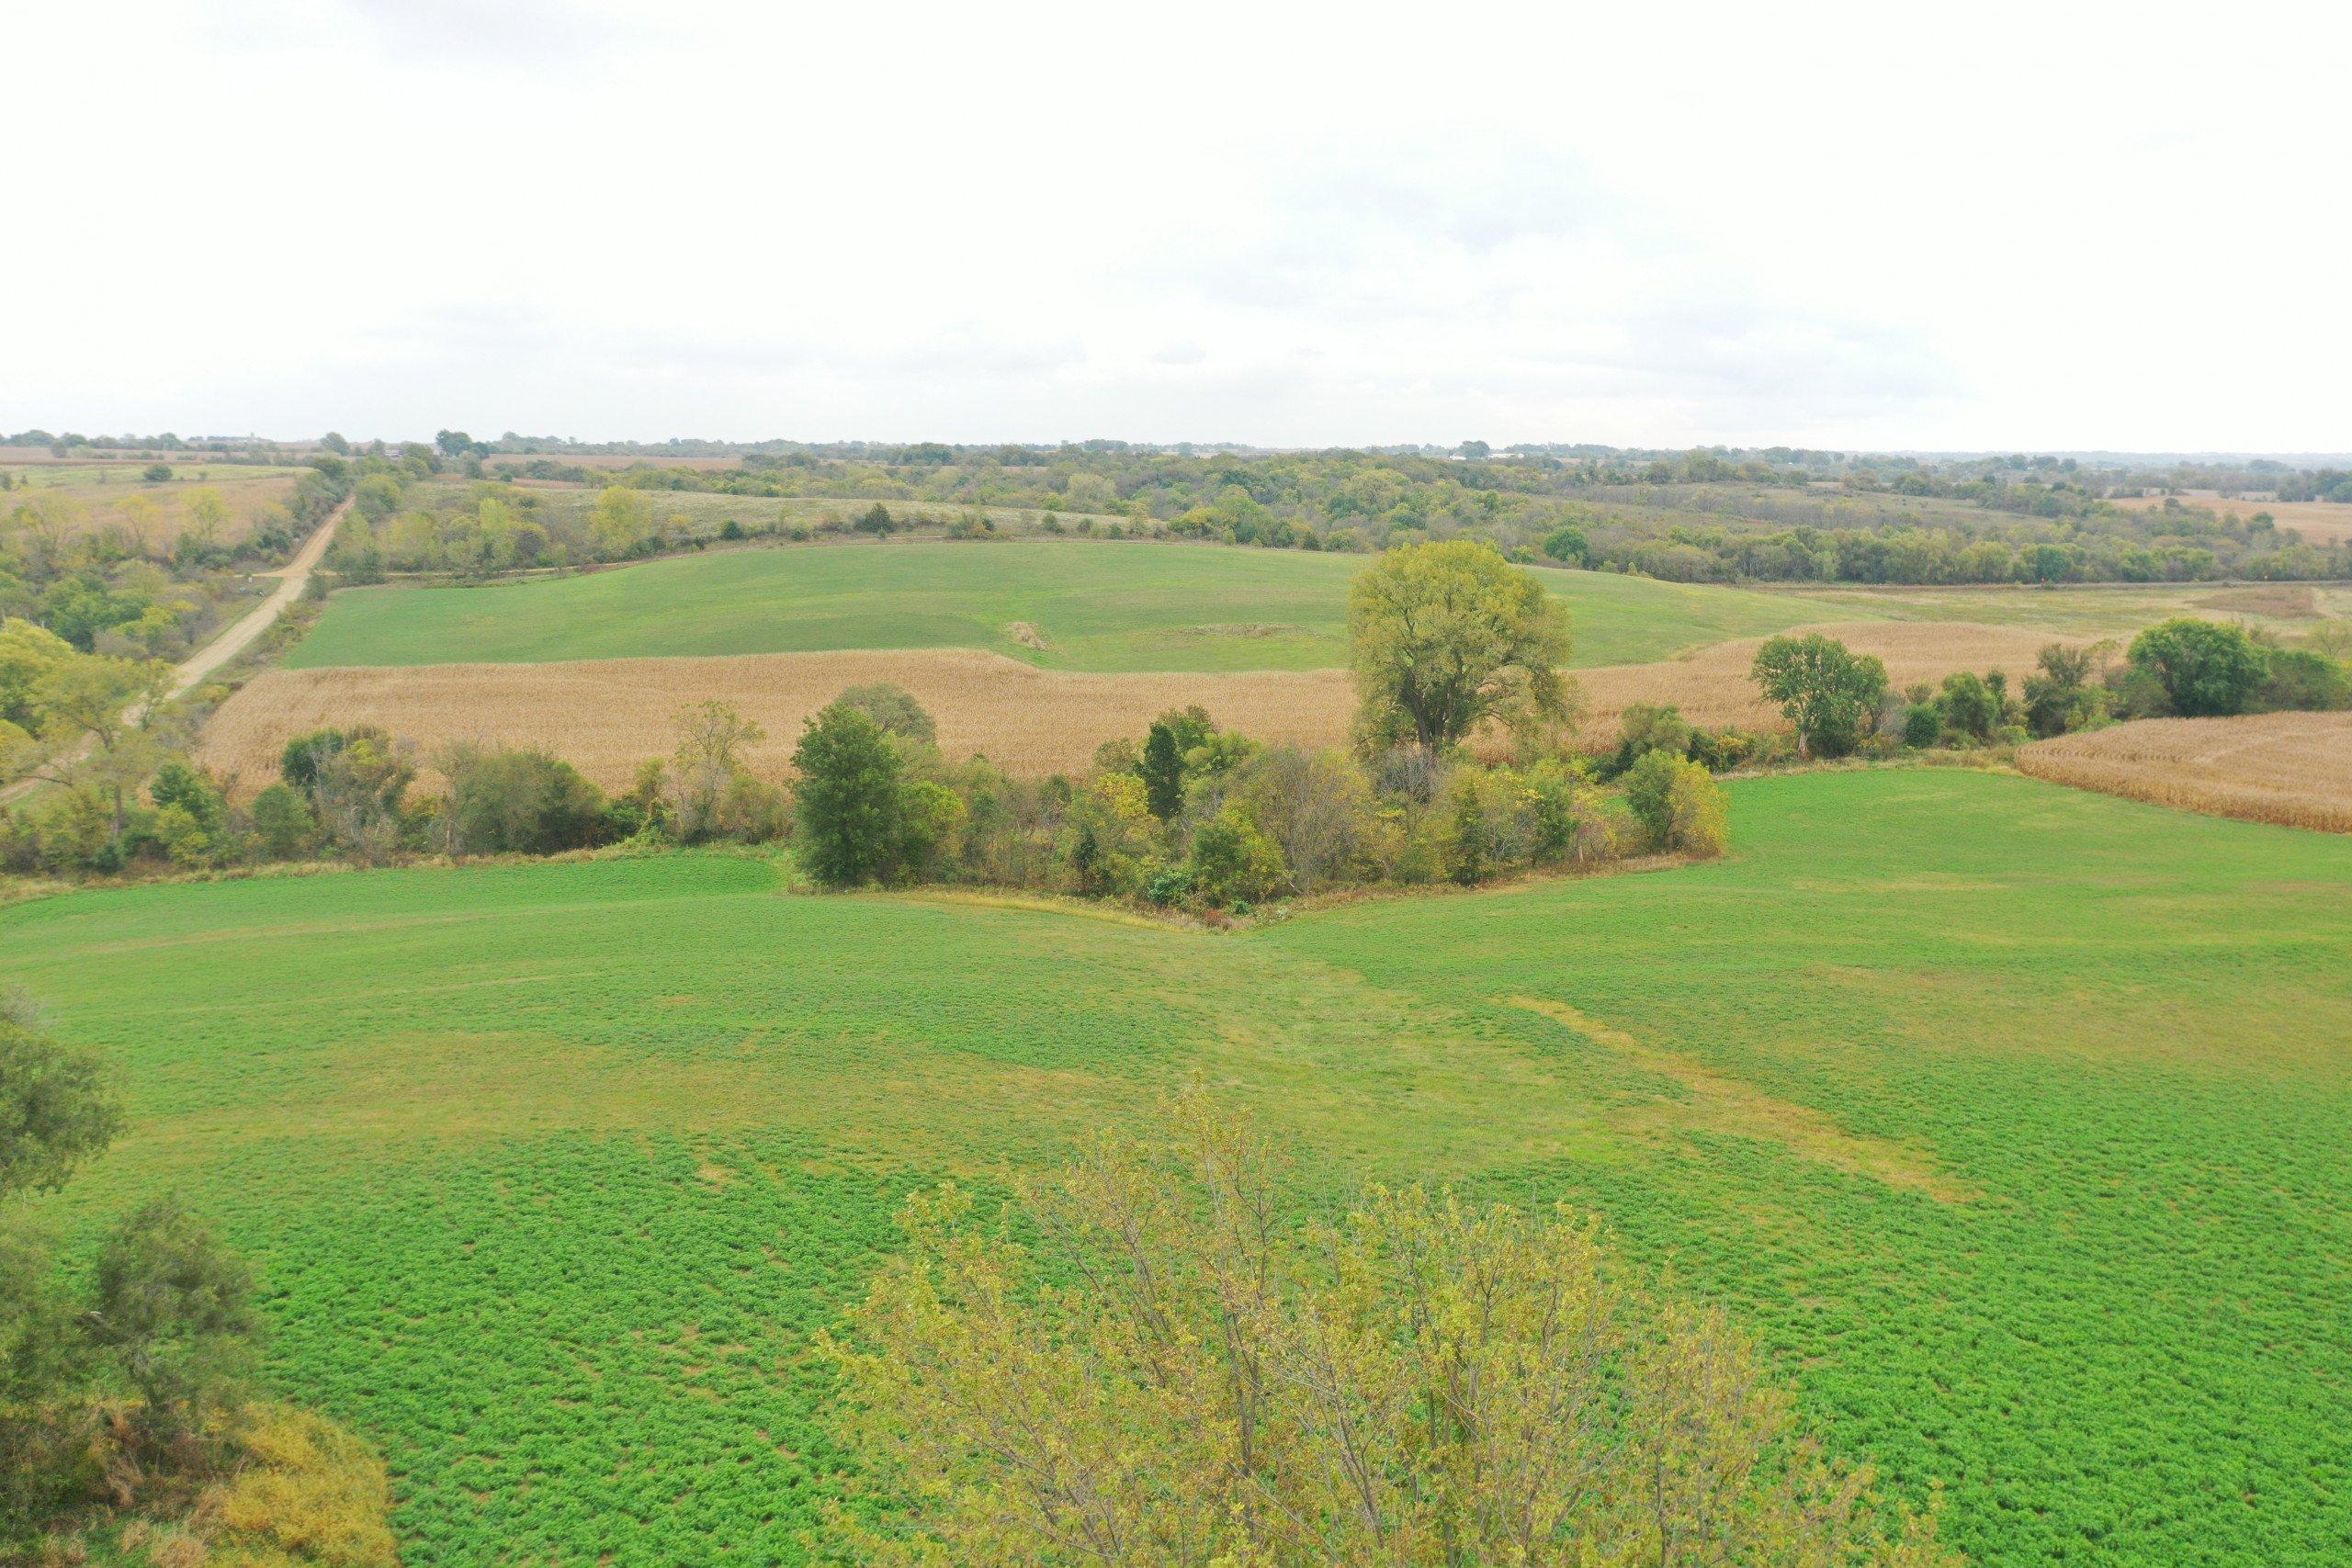 land-warren-county-iowa-200-acres-listing-number-15810-DJI_0559-0.jpg